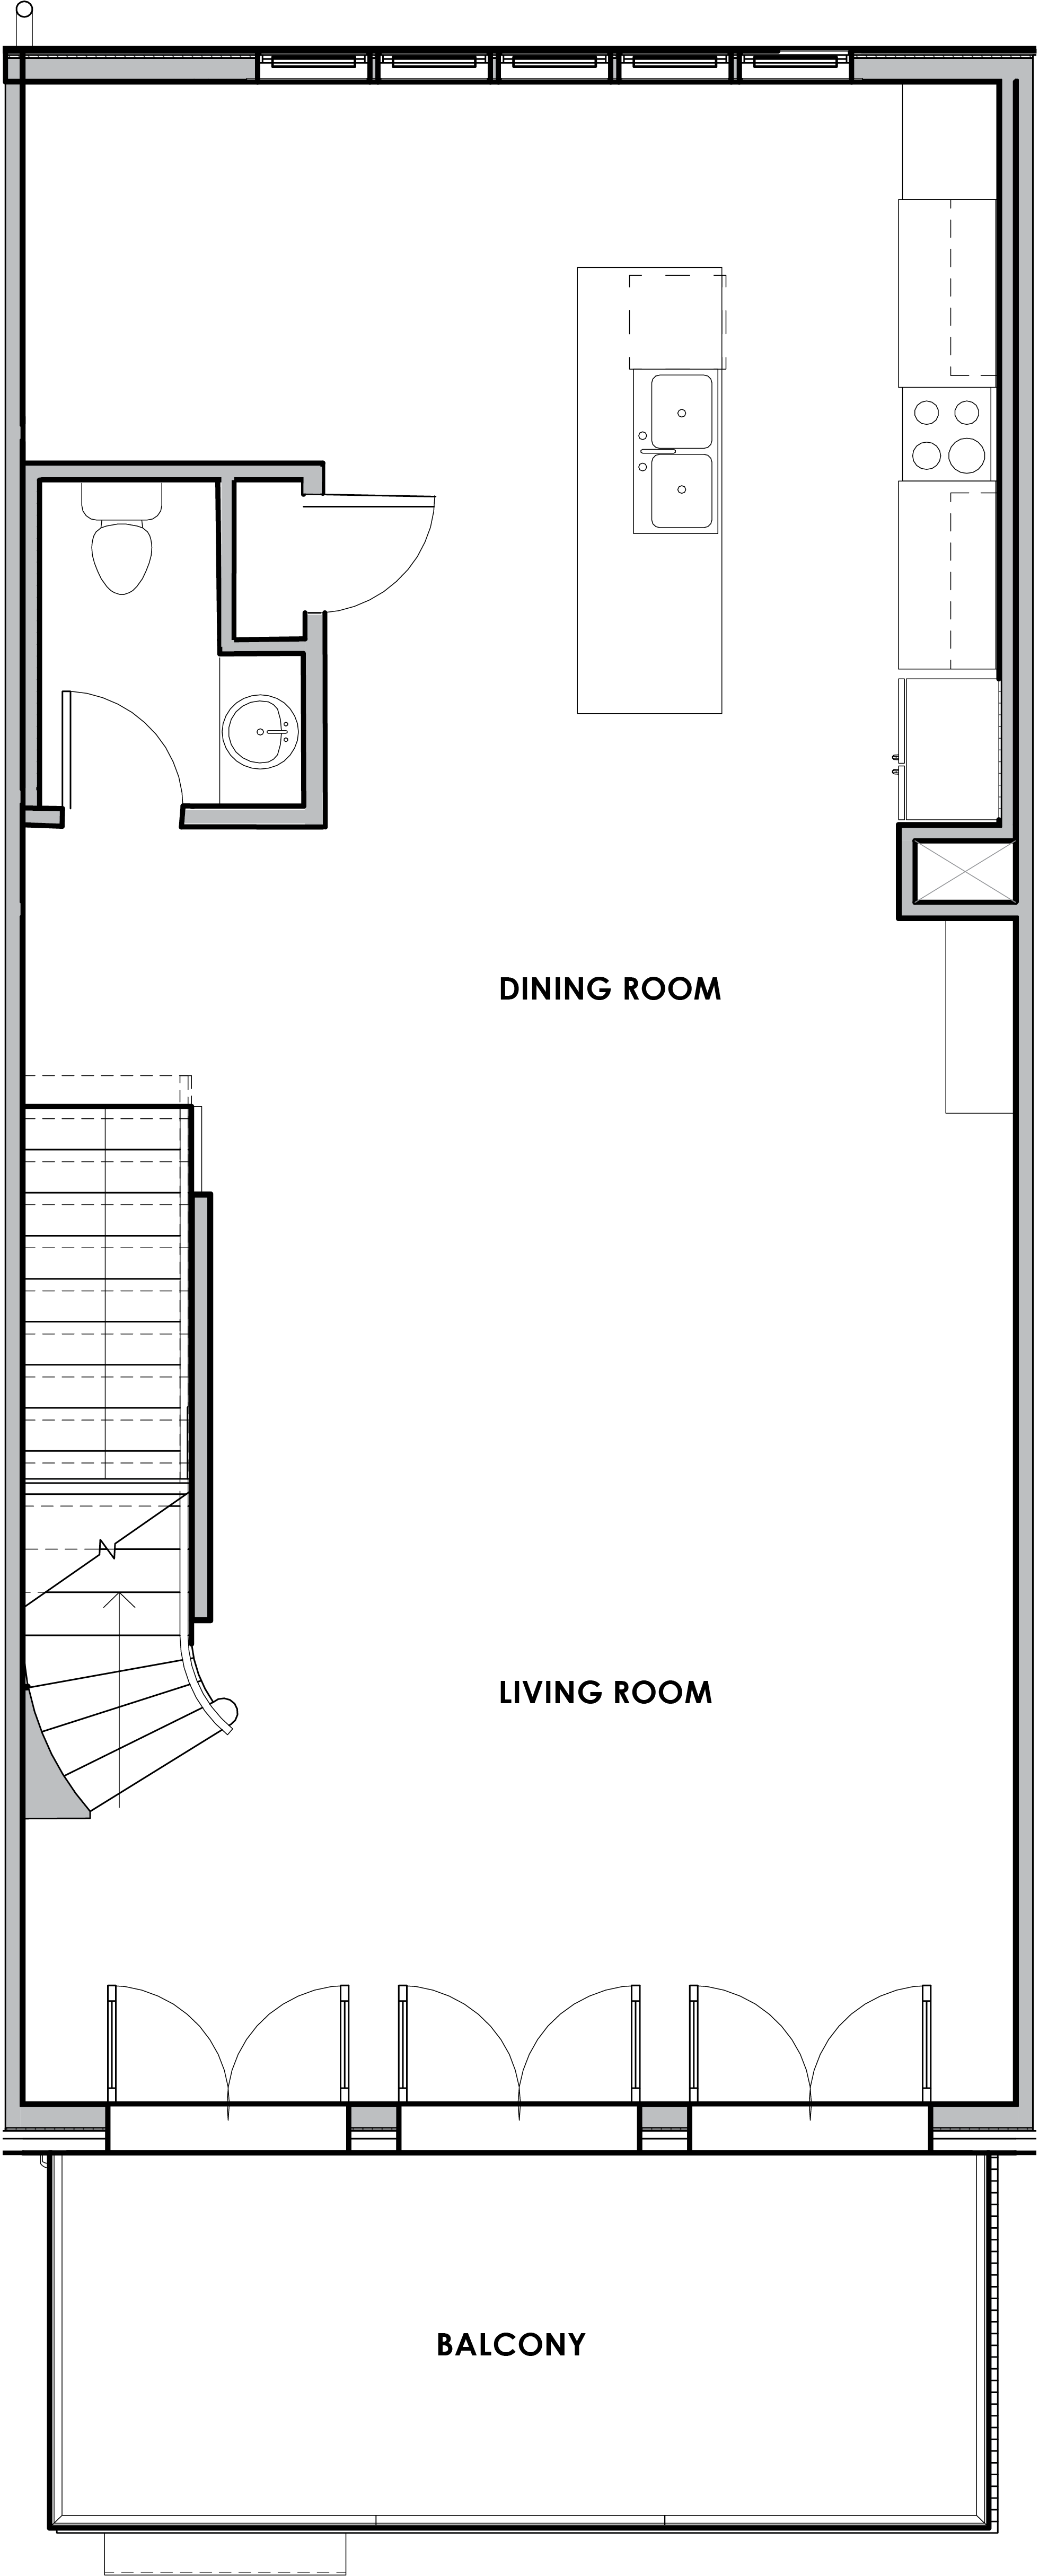 The-Fairmont-secod-Floor20171127155808